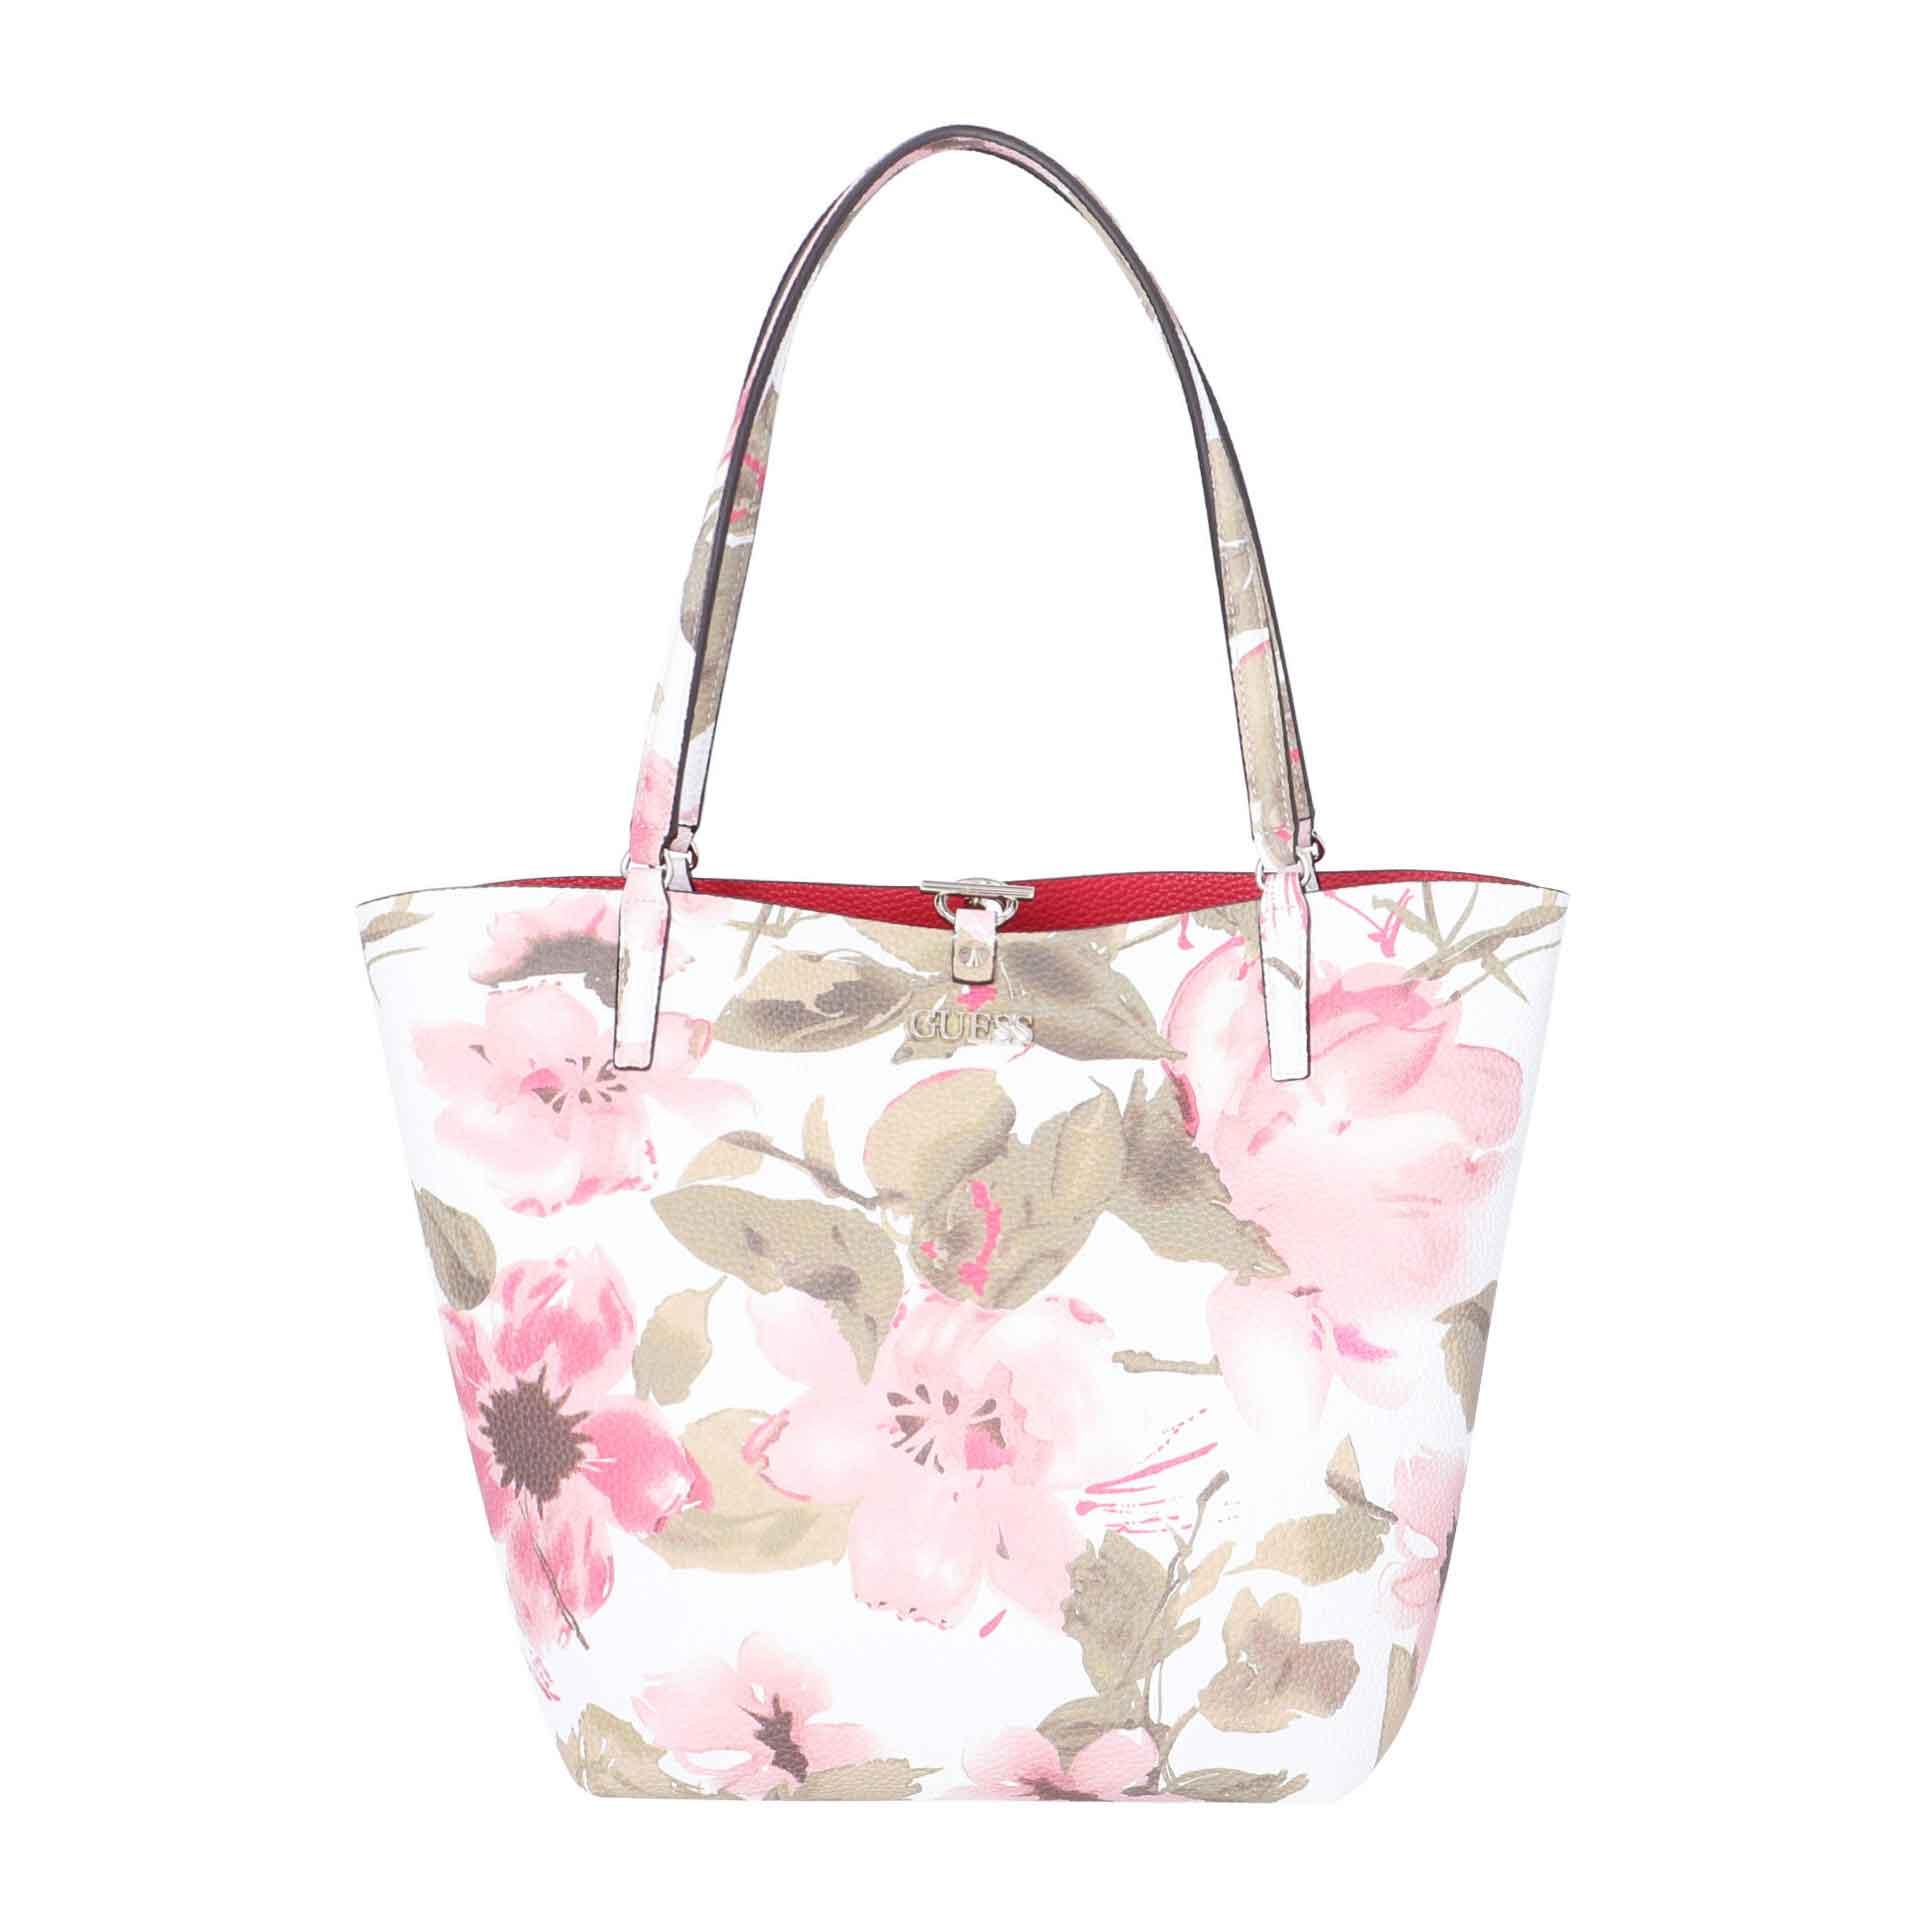 Guess Alby Shopper mit herausnehmbarer Pochette spring floral